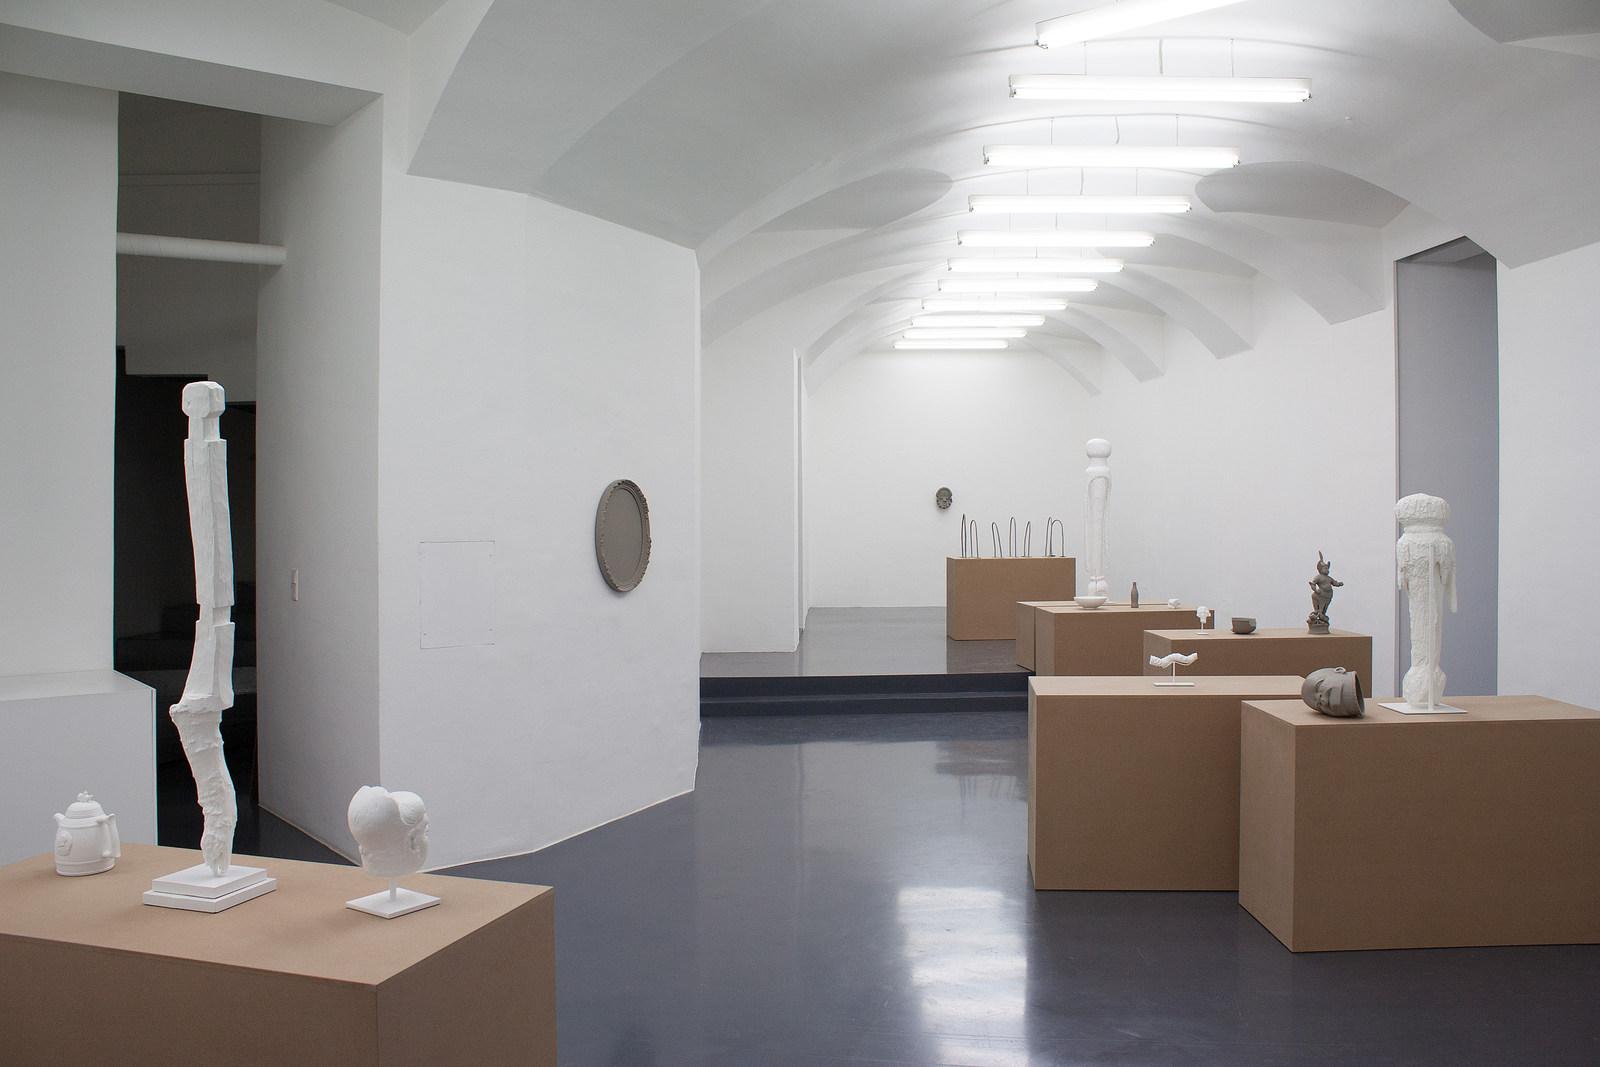 3 Gaylen Gerber exhibition Galerie Emanuel Layr Wien 2016 IMG_8360